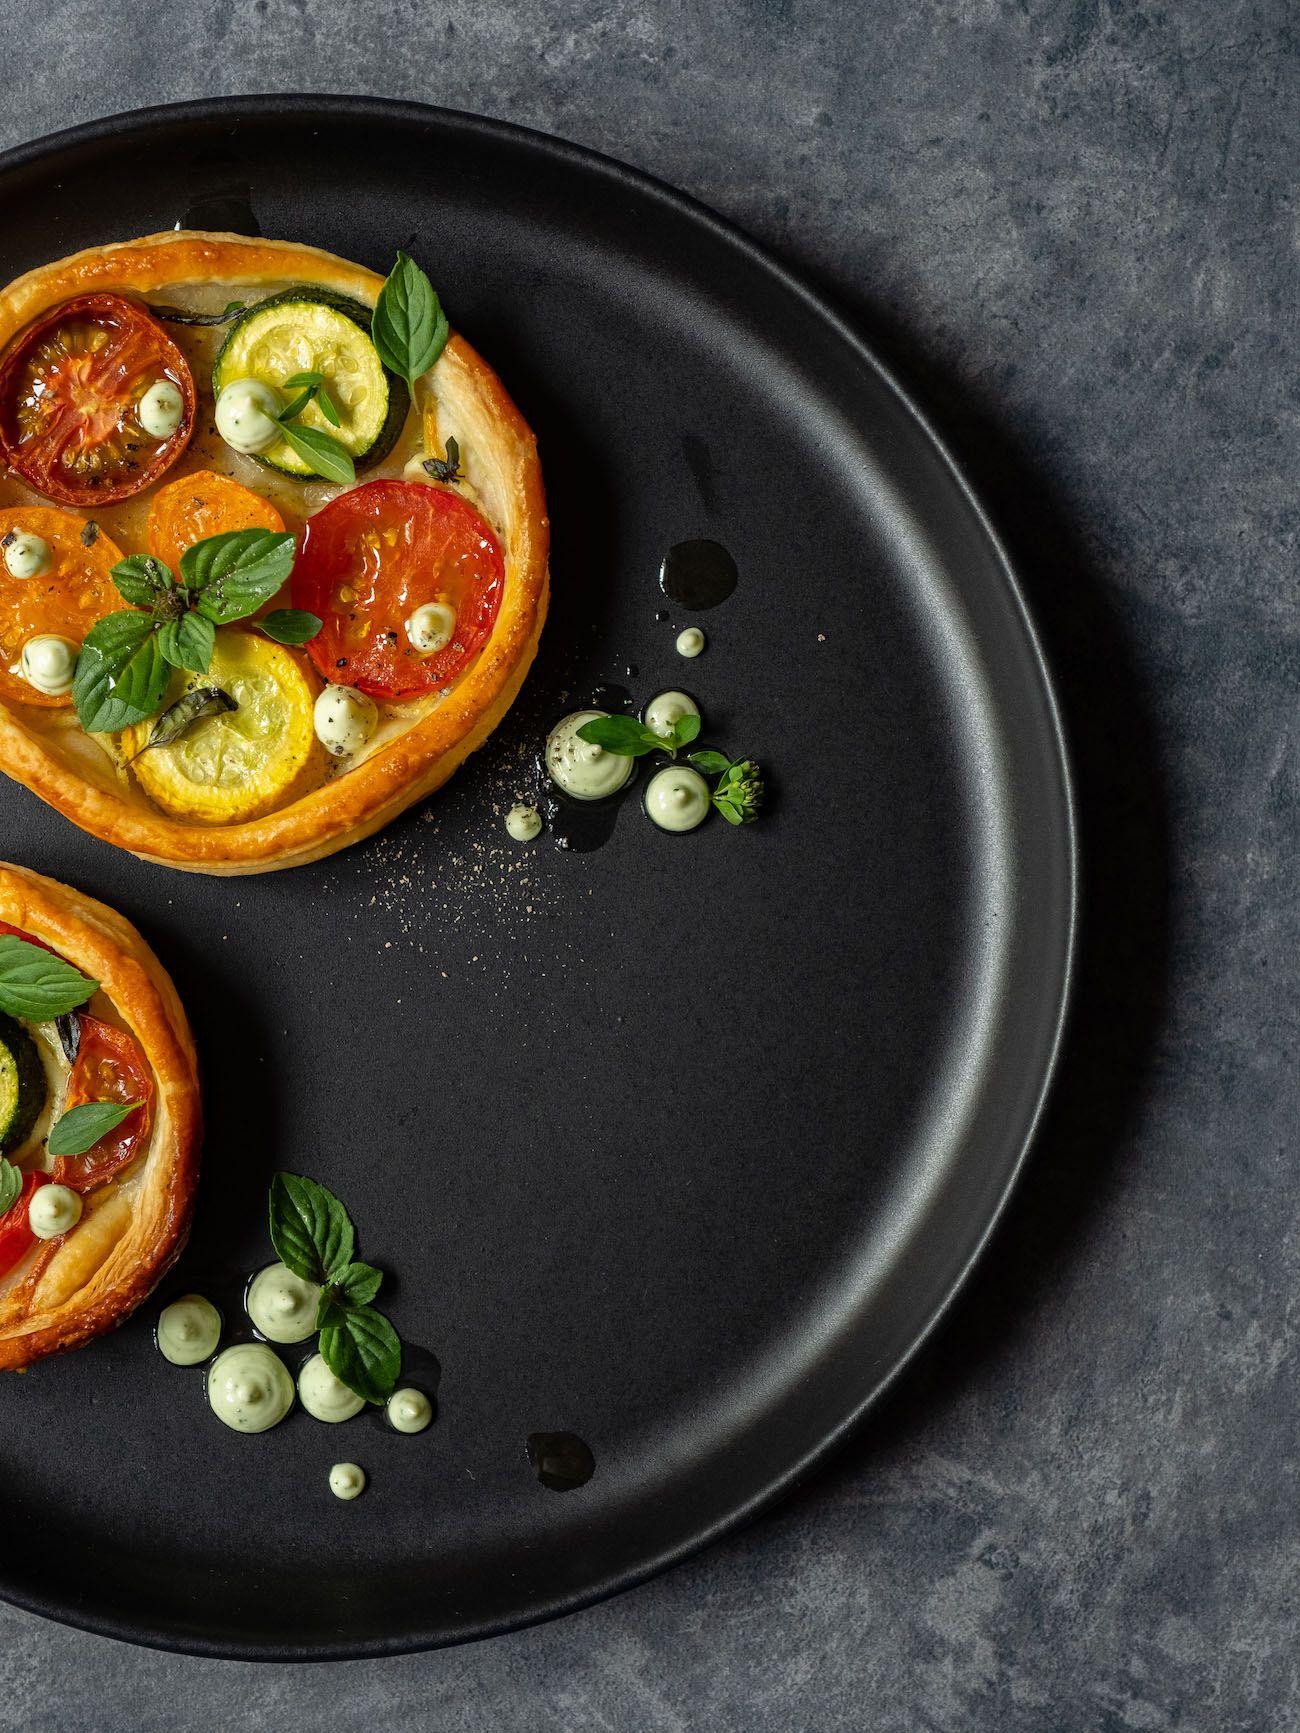 Rezept, Foodblog, About Fuel, Tomaten Zucchini Tartelettes mit Basilikum Feta Creme, Oregano, Teller, Pfeffer